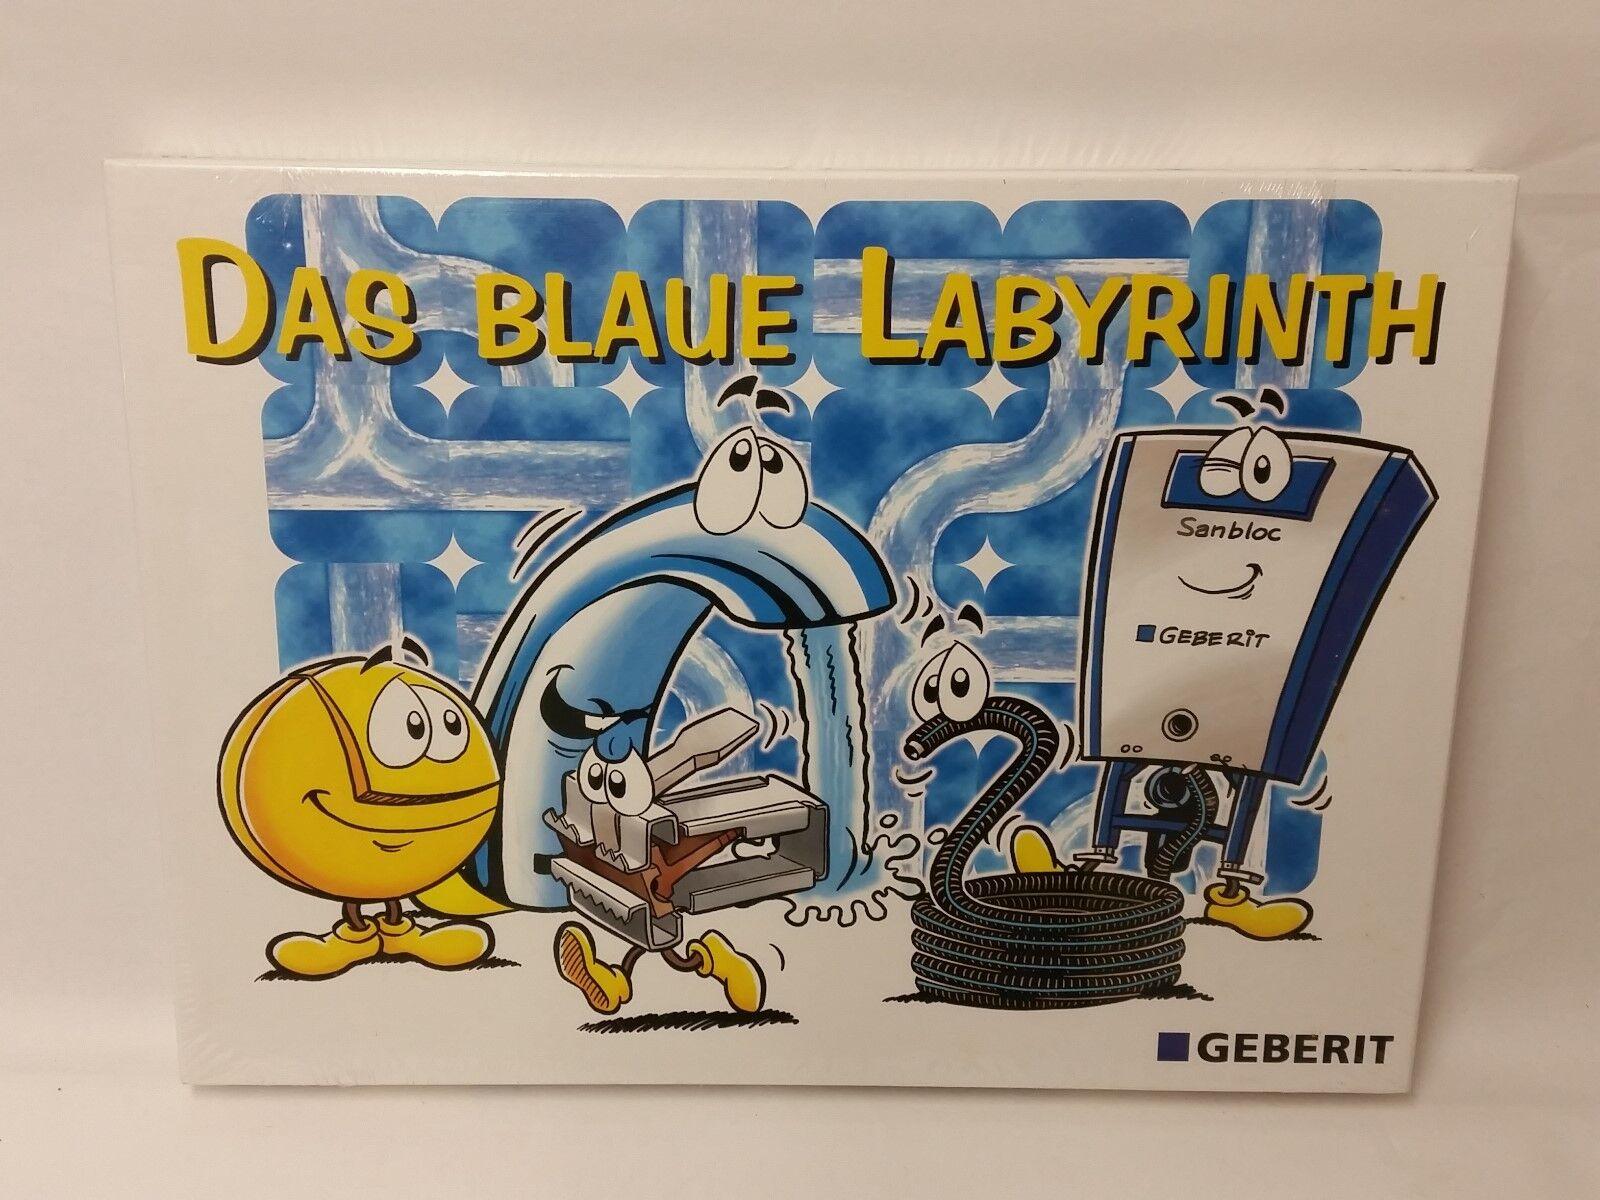 Le bleu labyrinthe-Spécial Edition de GEBERIT-Ravensburger-rare neuf dans sa boîte NEUF